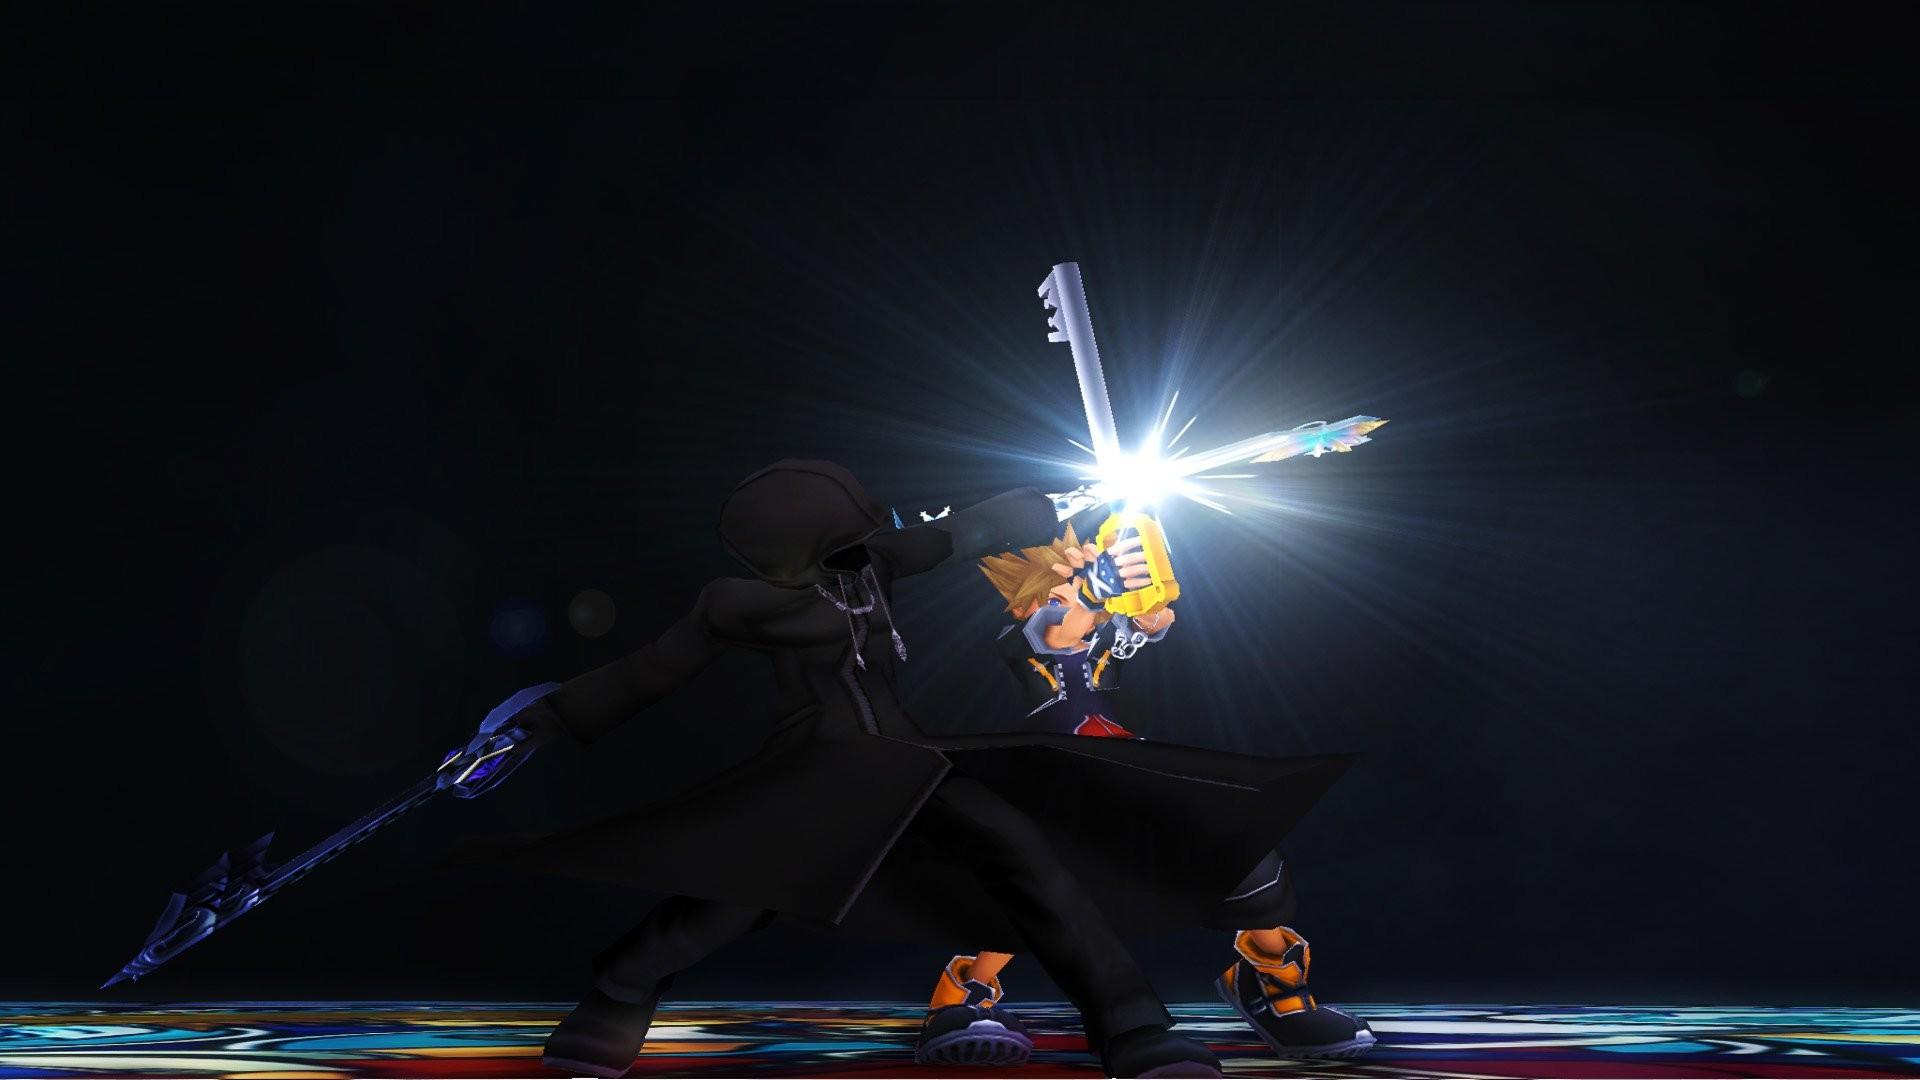 Anime Kingdom Hearts · HD Wallpaper   Background ID:204179